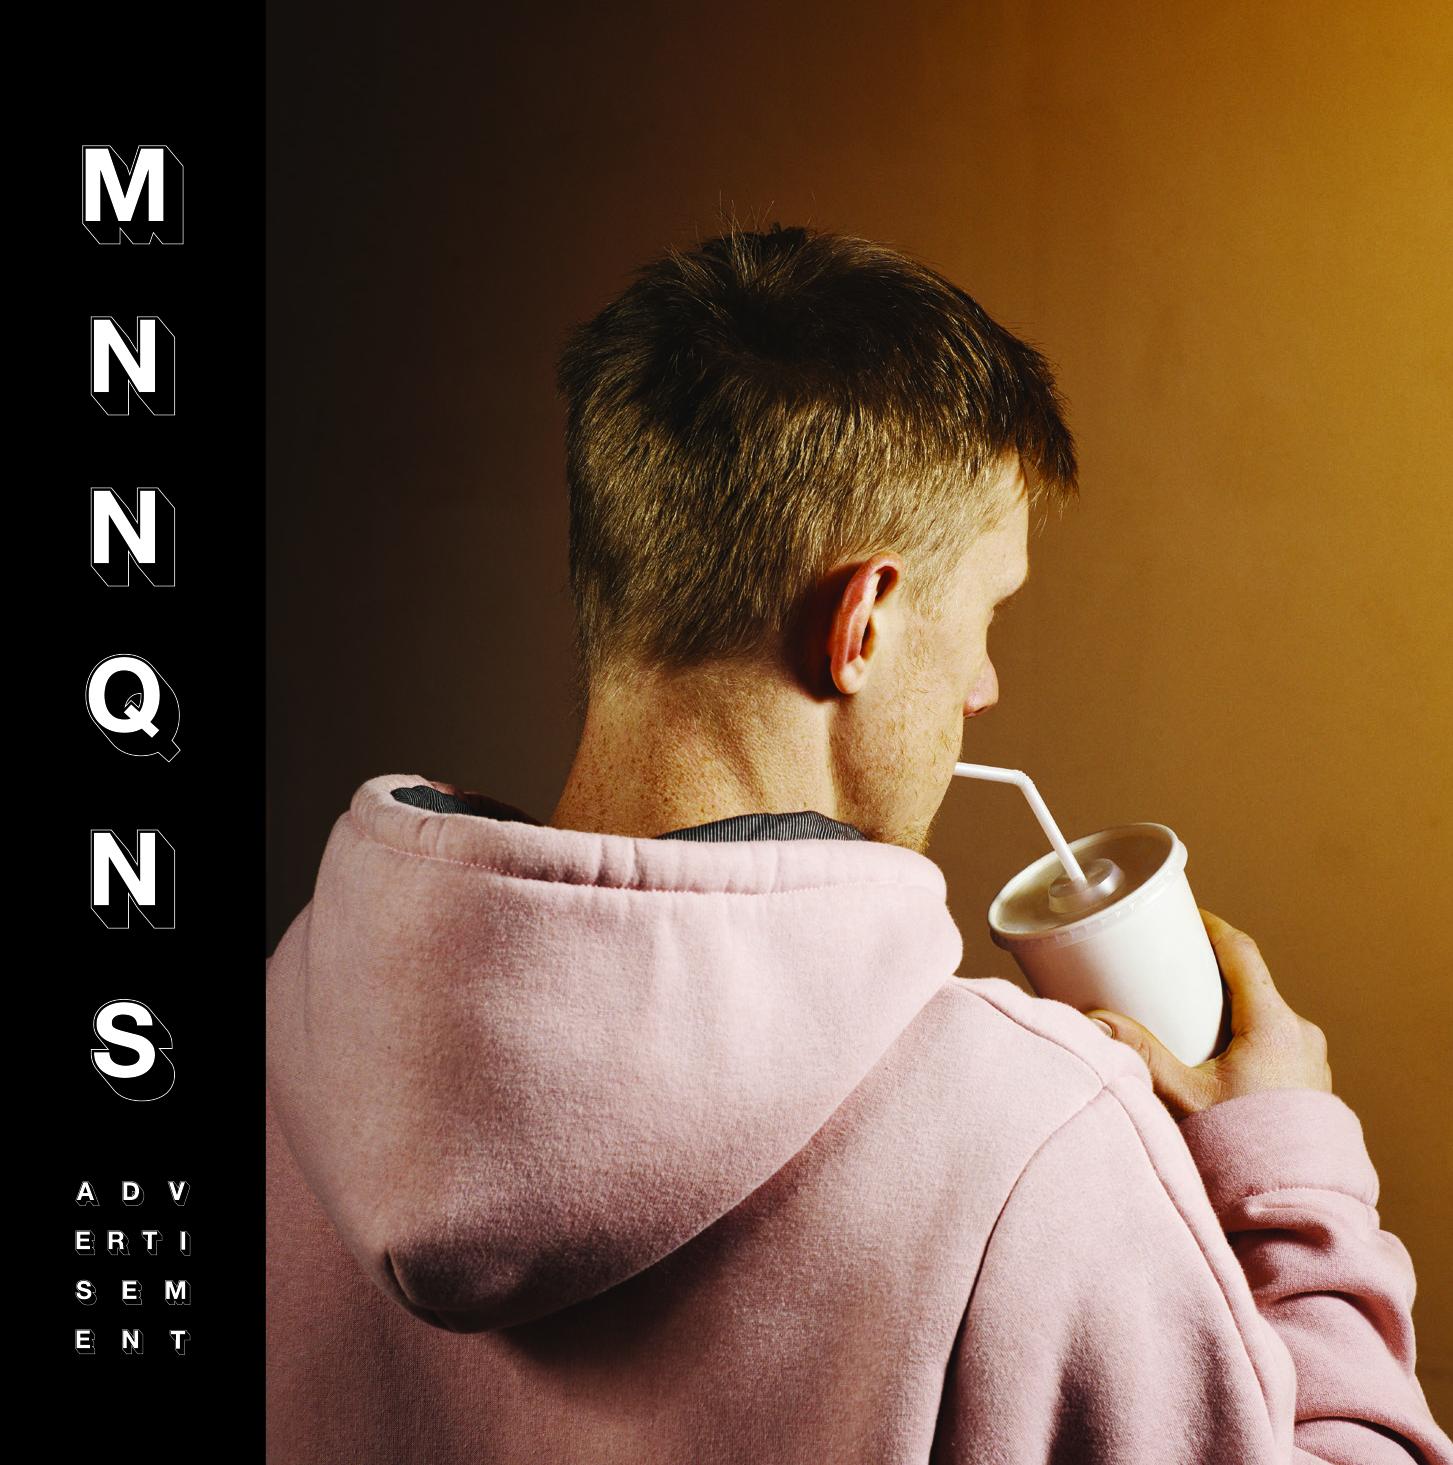 MNNQNS – Advertisement